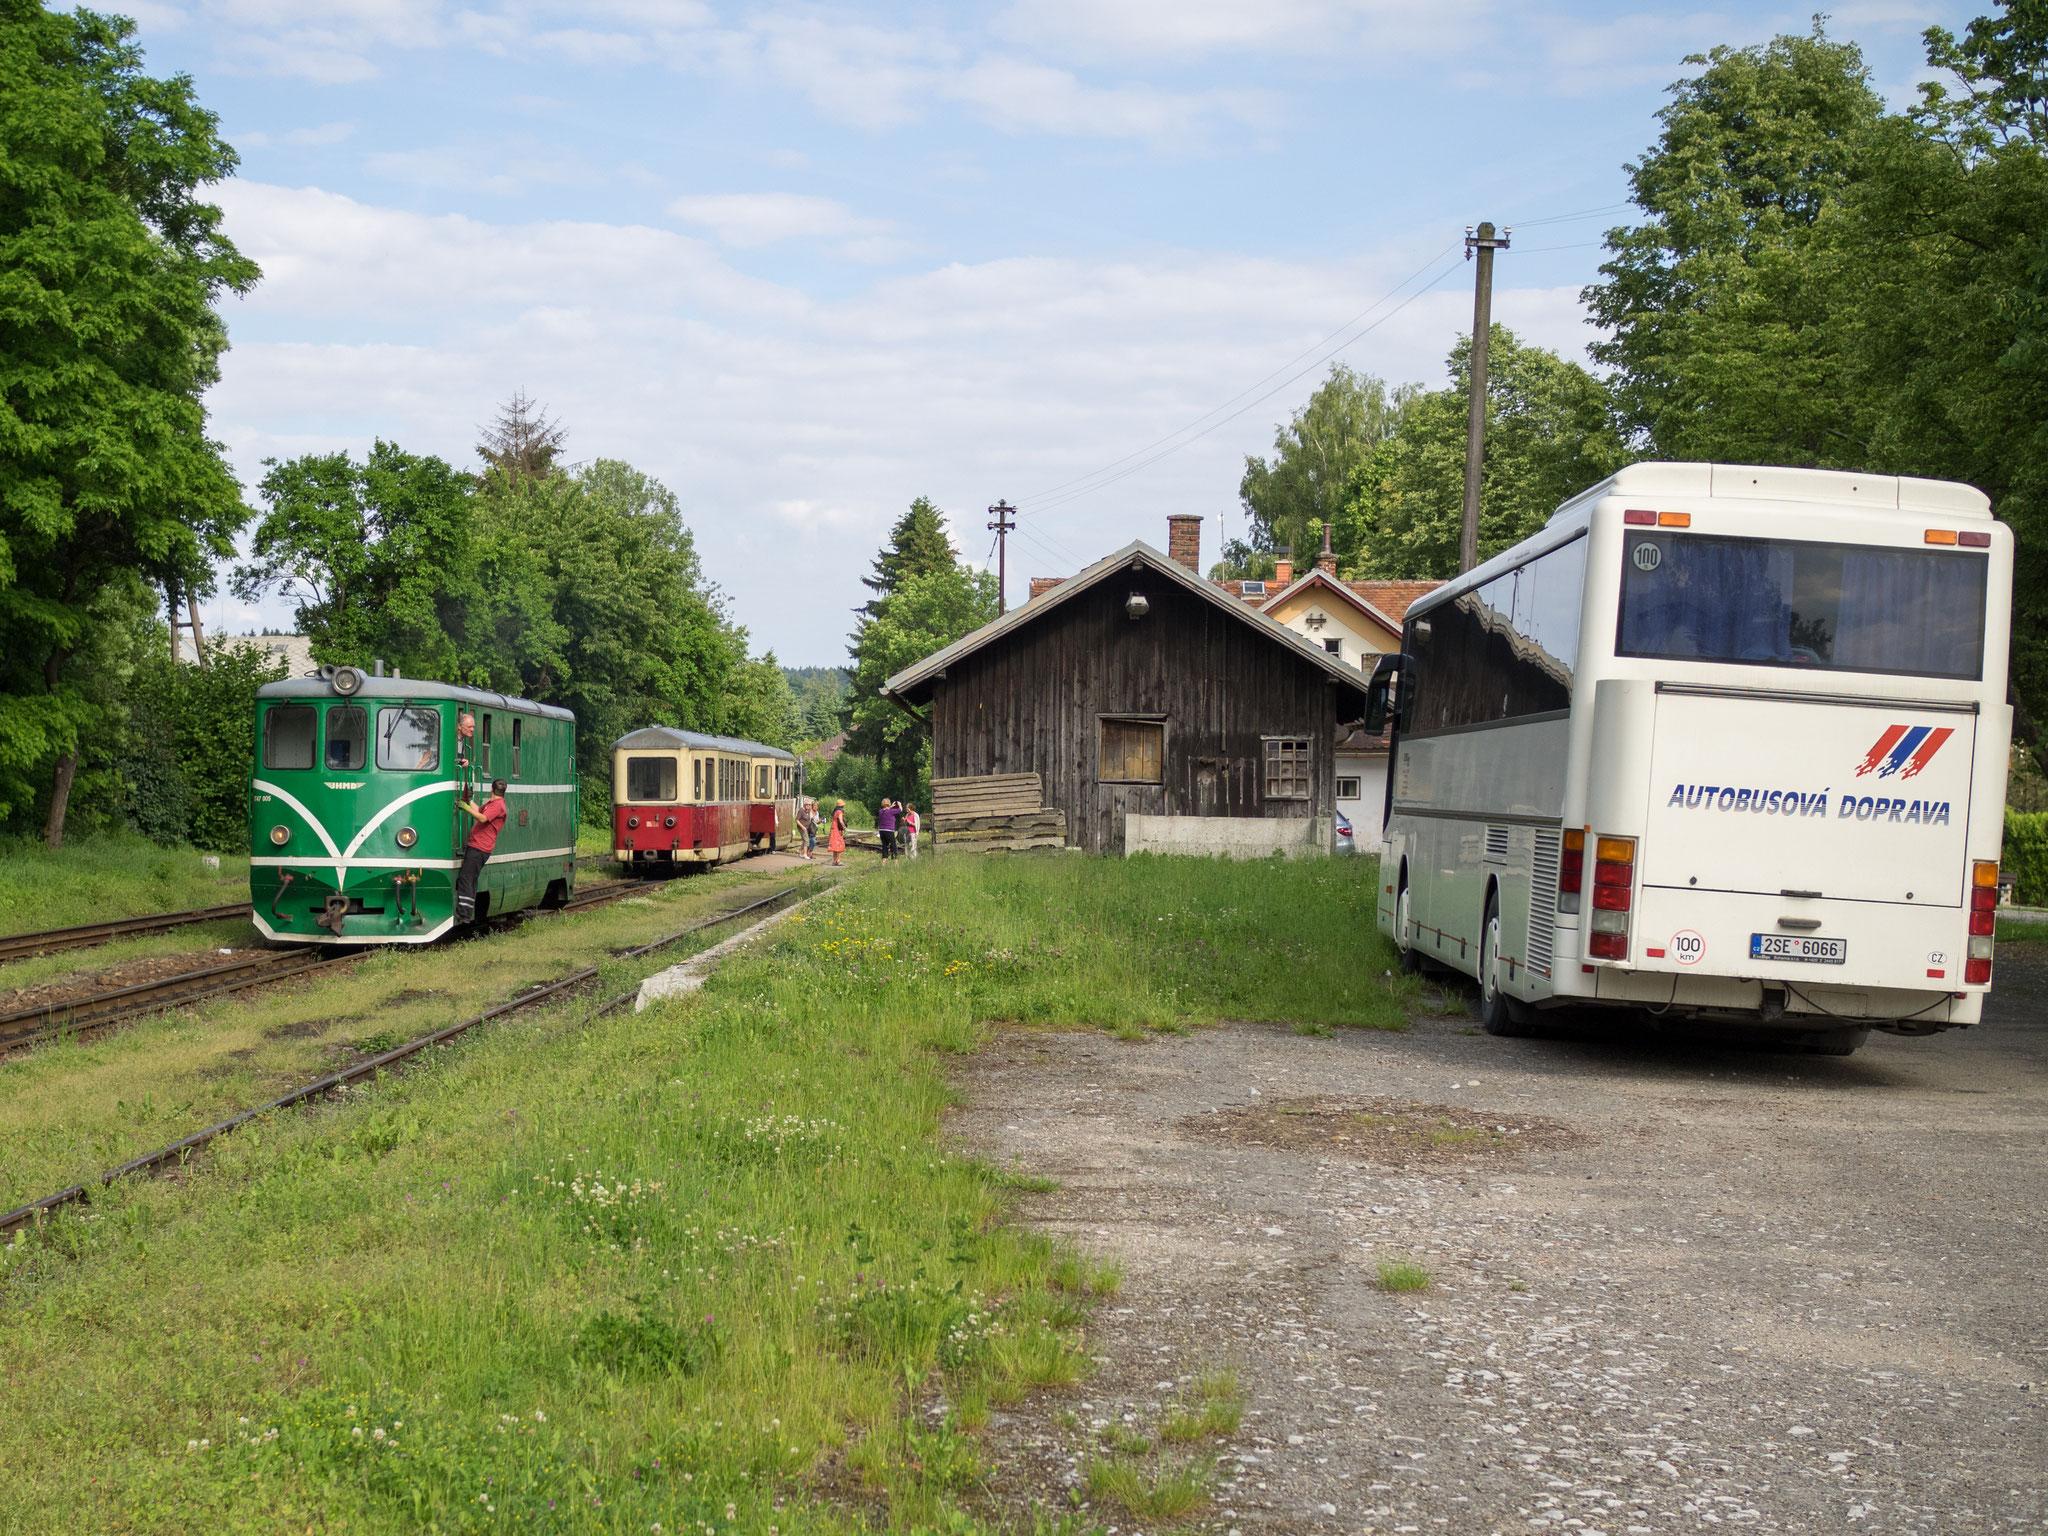 Ankunft in Cernovice u Tabora